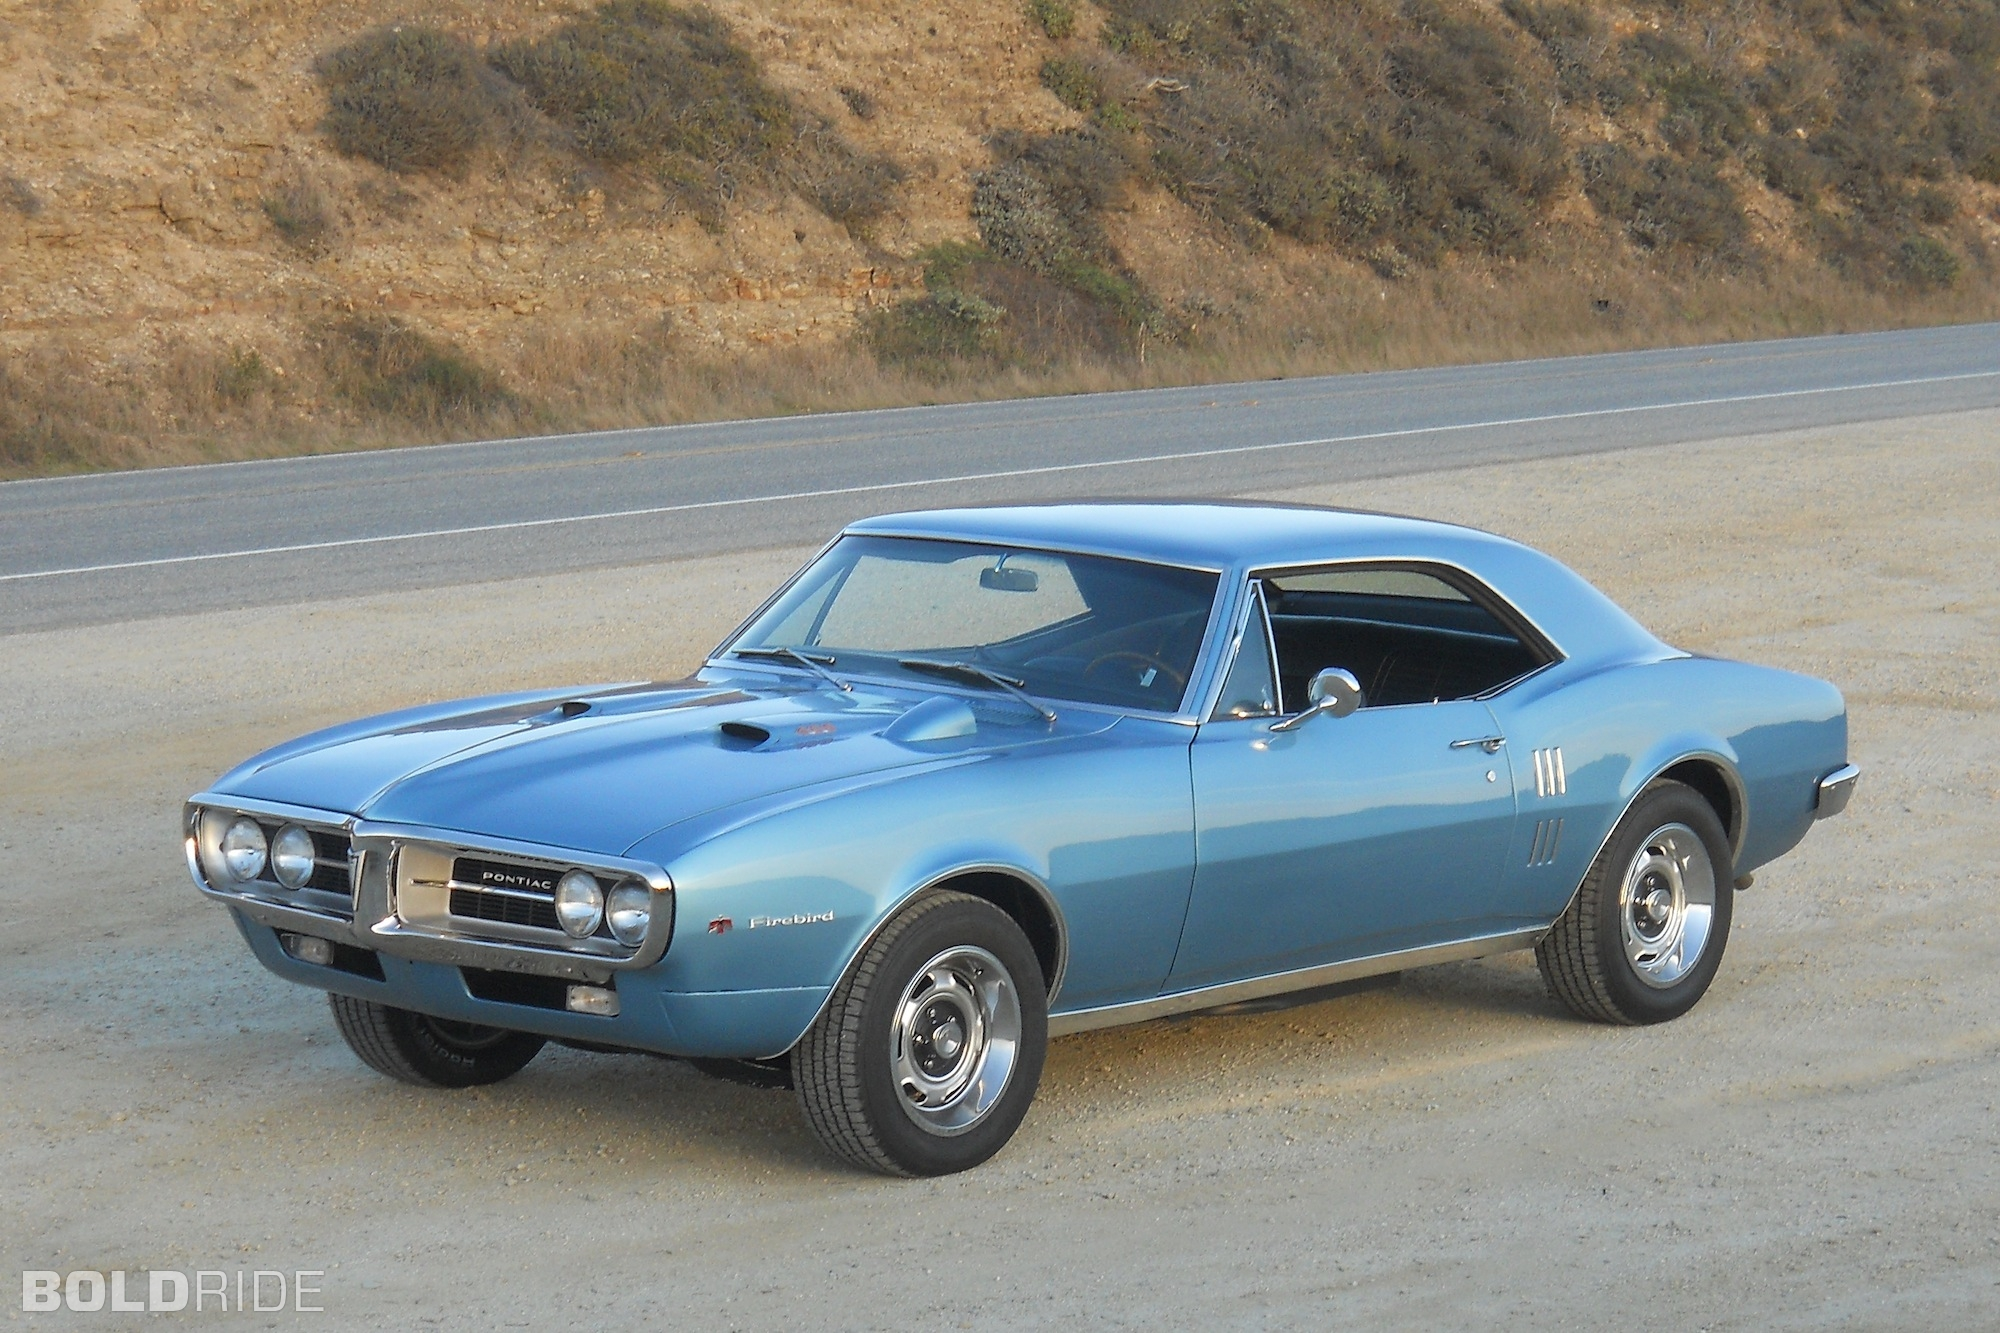 Pontiac Firebird I 1967 - 1969 Coupe-Hardtop #2